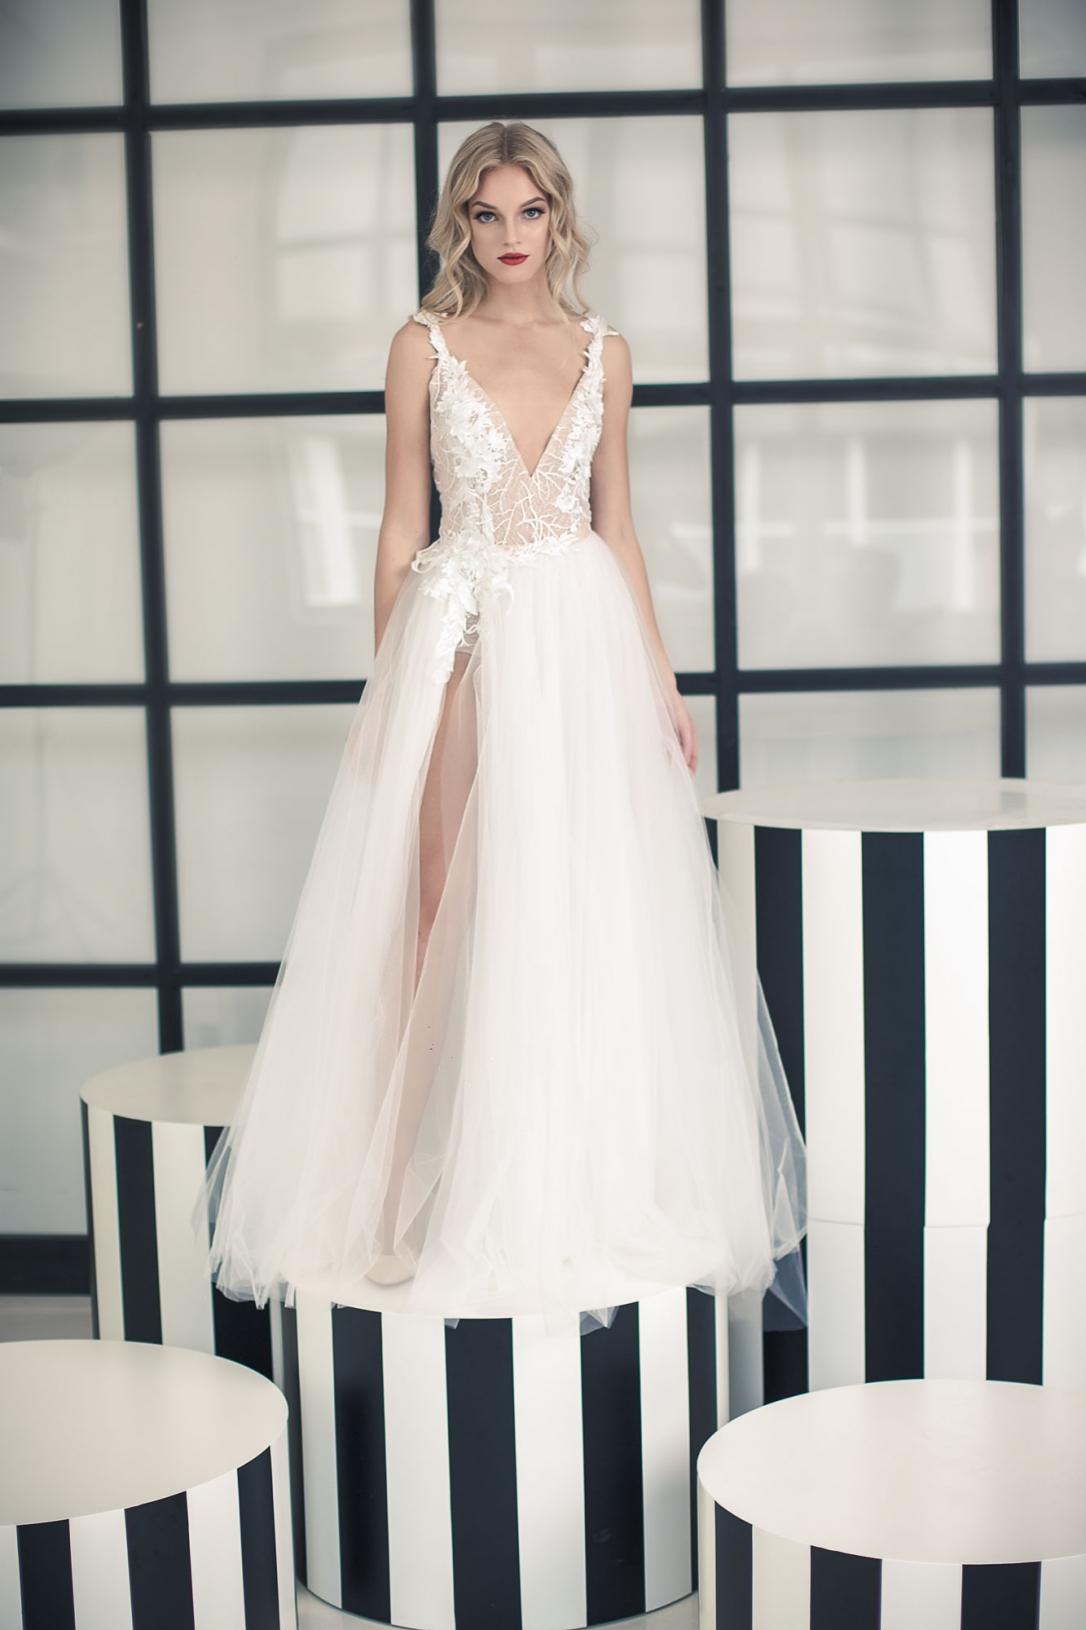 246bf8e5b32dae7 Свадебное Платье 244 - Tiuliofeja